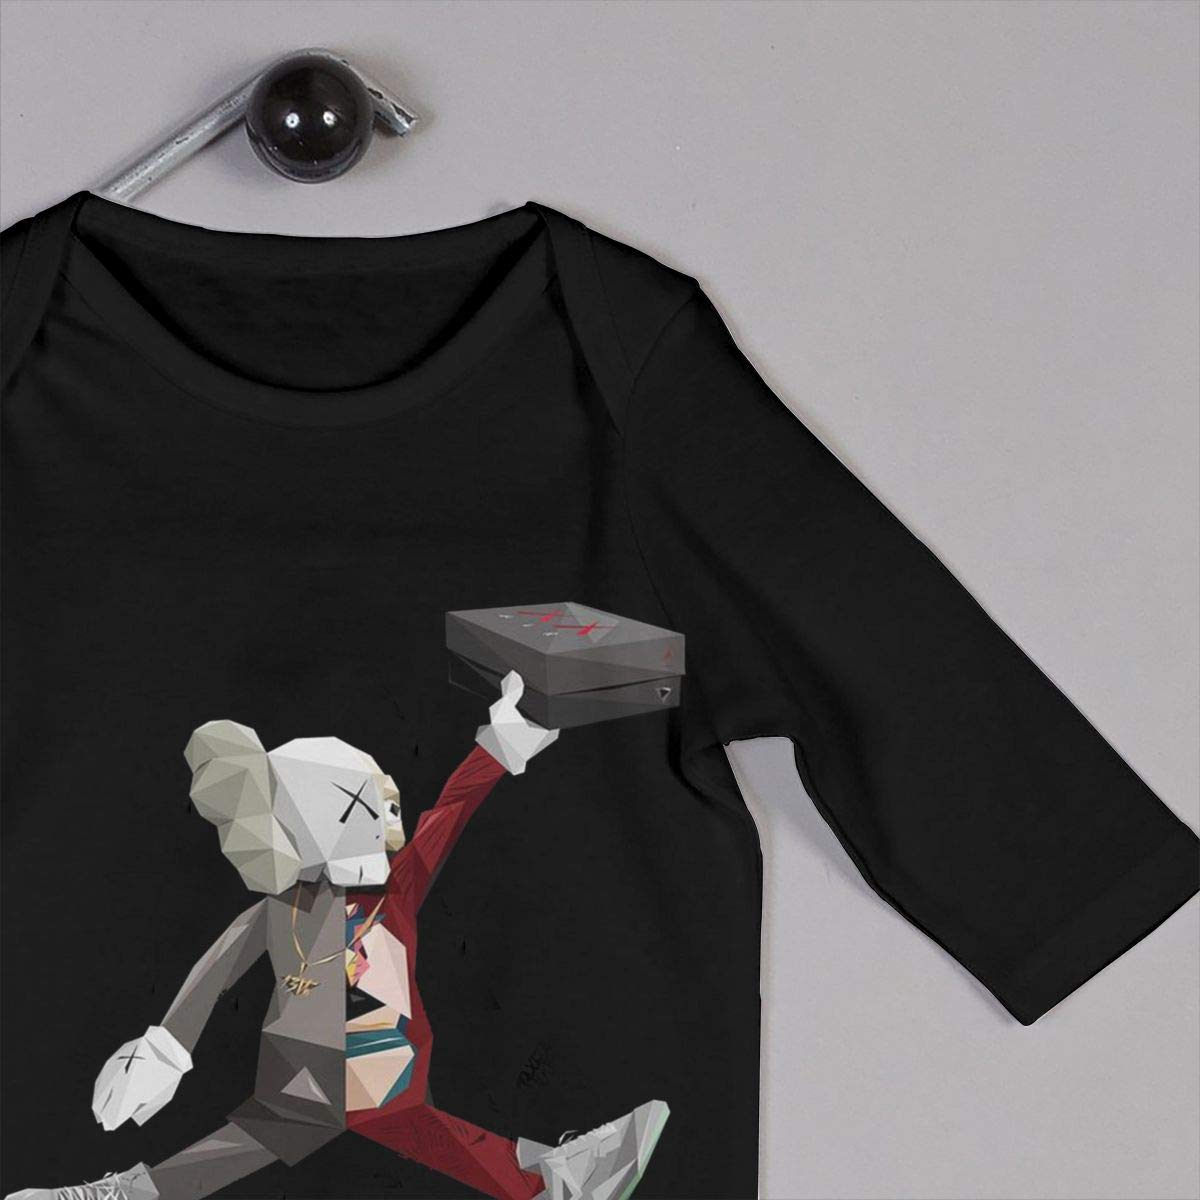 SININIDR Newborn Jumpsuit Infant Baby Girls KAWS Long-Sleeve Bodysuit Playsuit Outfits Clothes Black